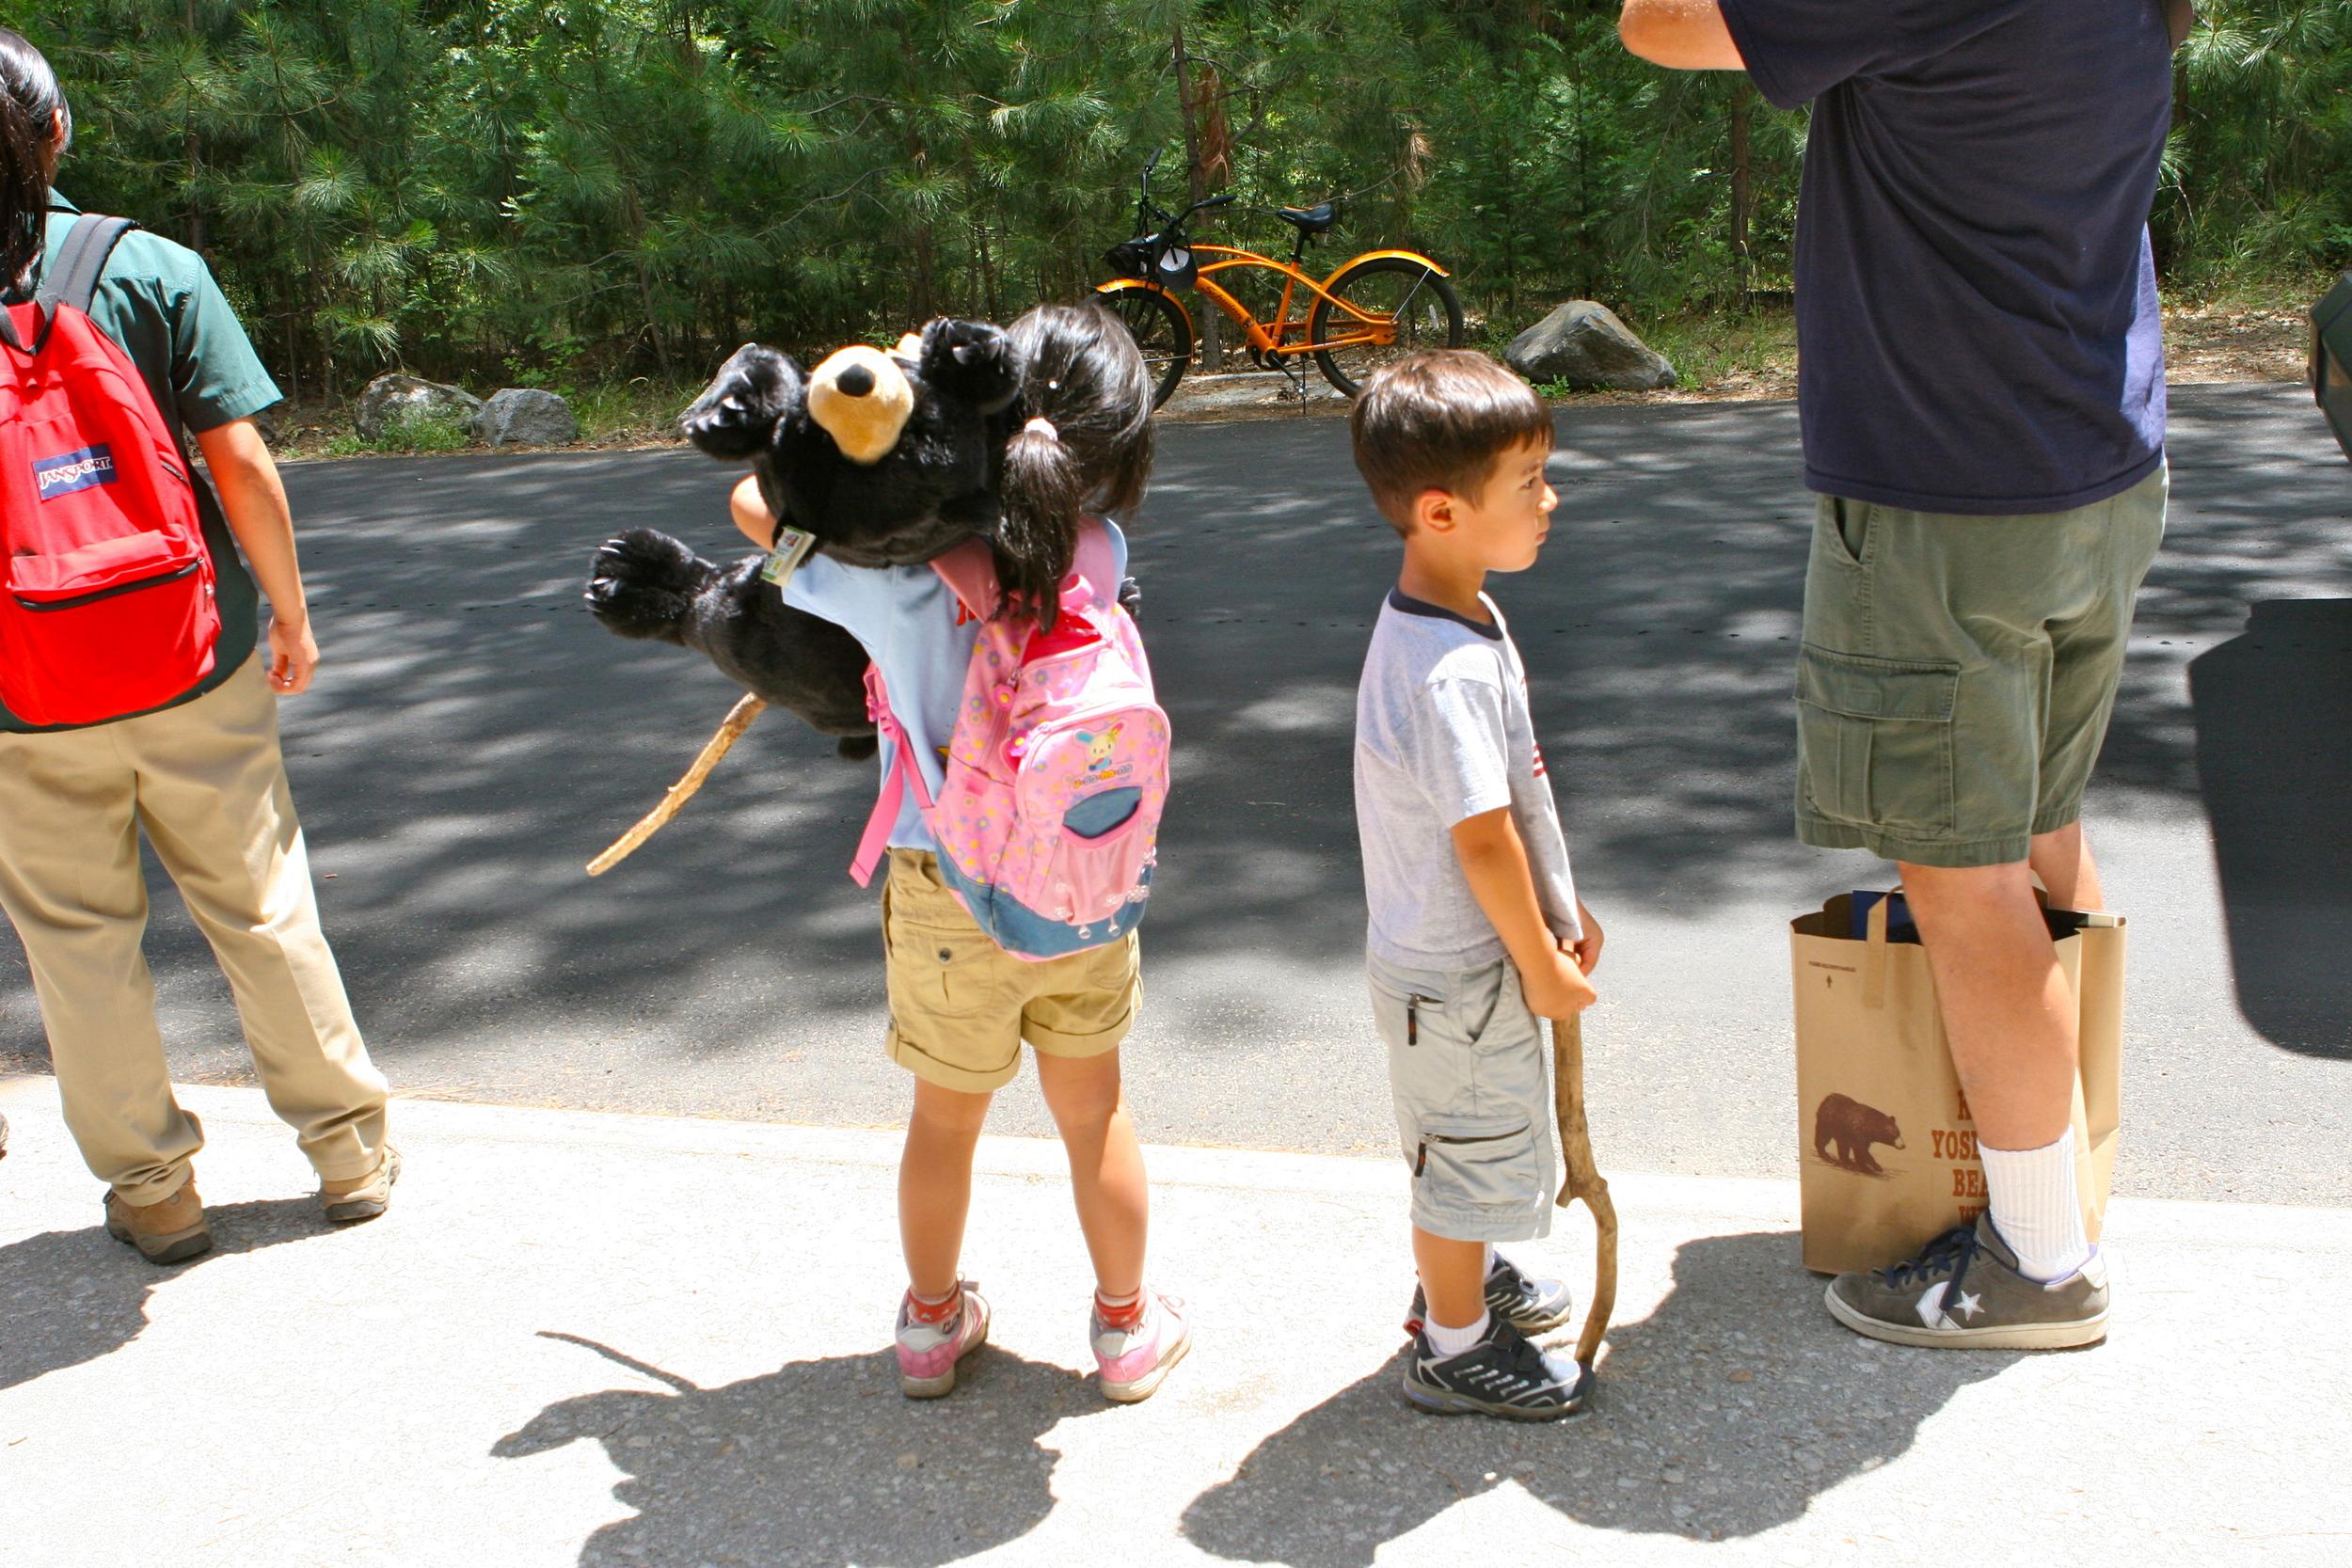 Kids at Yosemite National Park